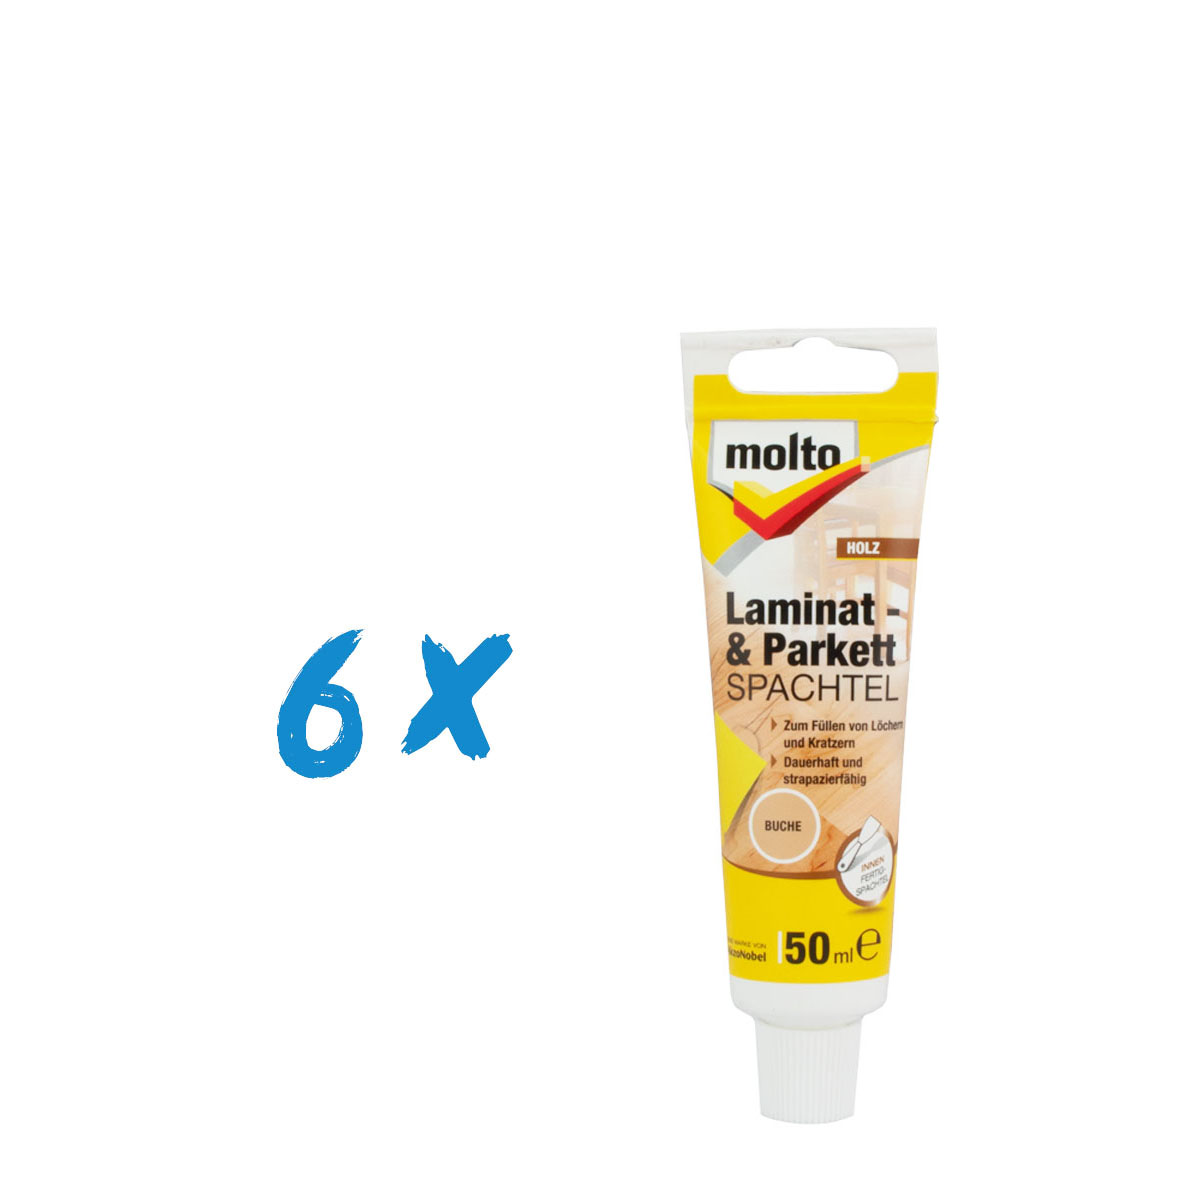 6x Molto Laminat & Parkett Spachtel Buche 50ml